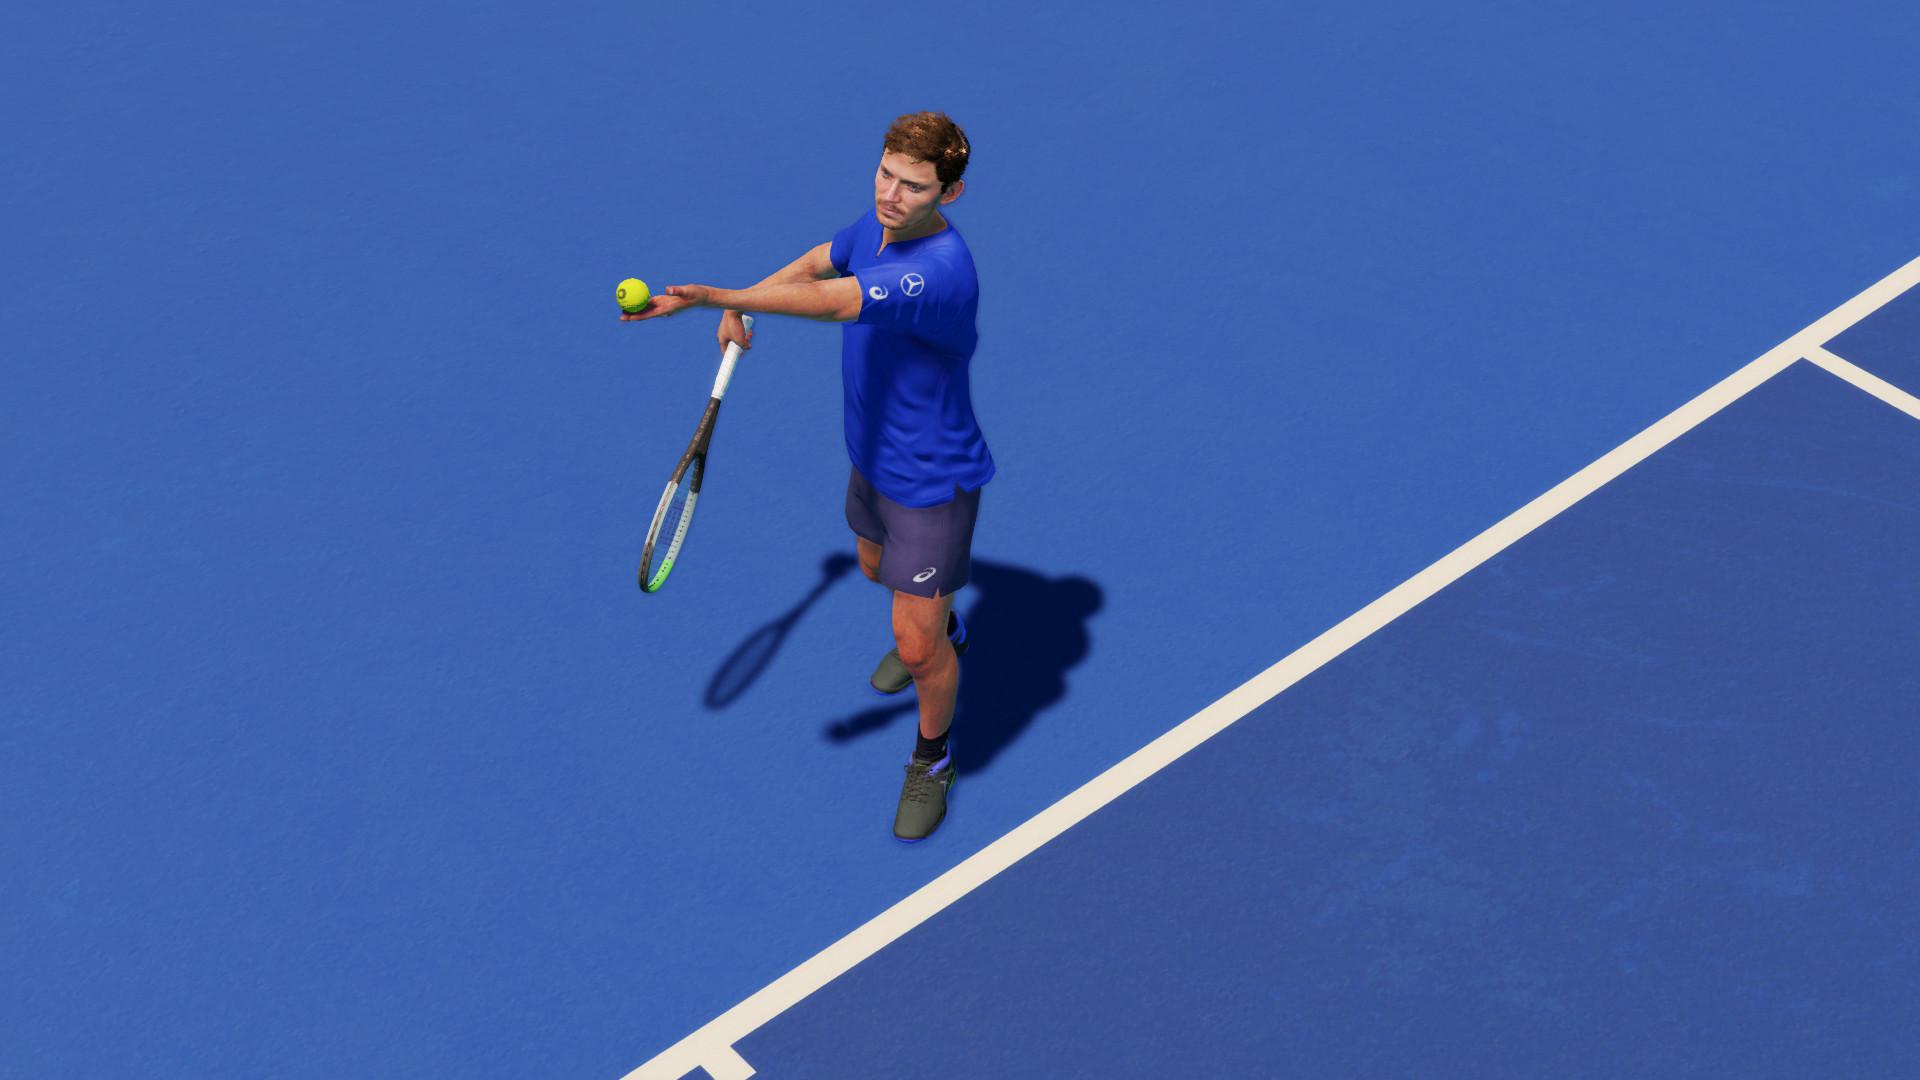 <b>(한글)에이오 테니스 AO Tennis 2 스포츠 케쥬얼</b>